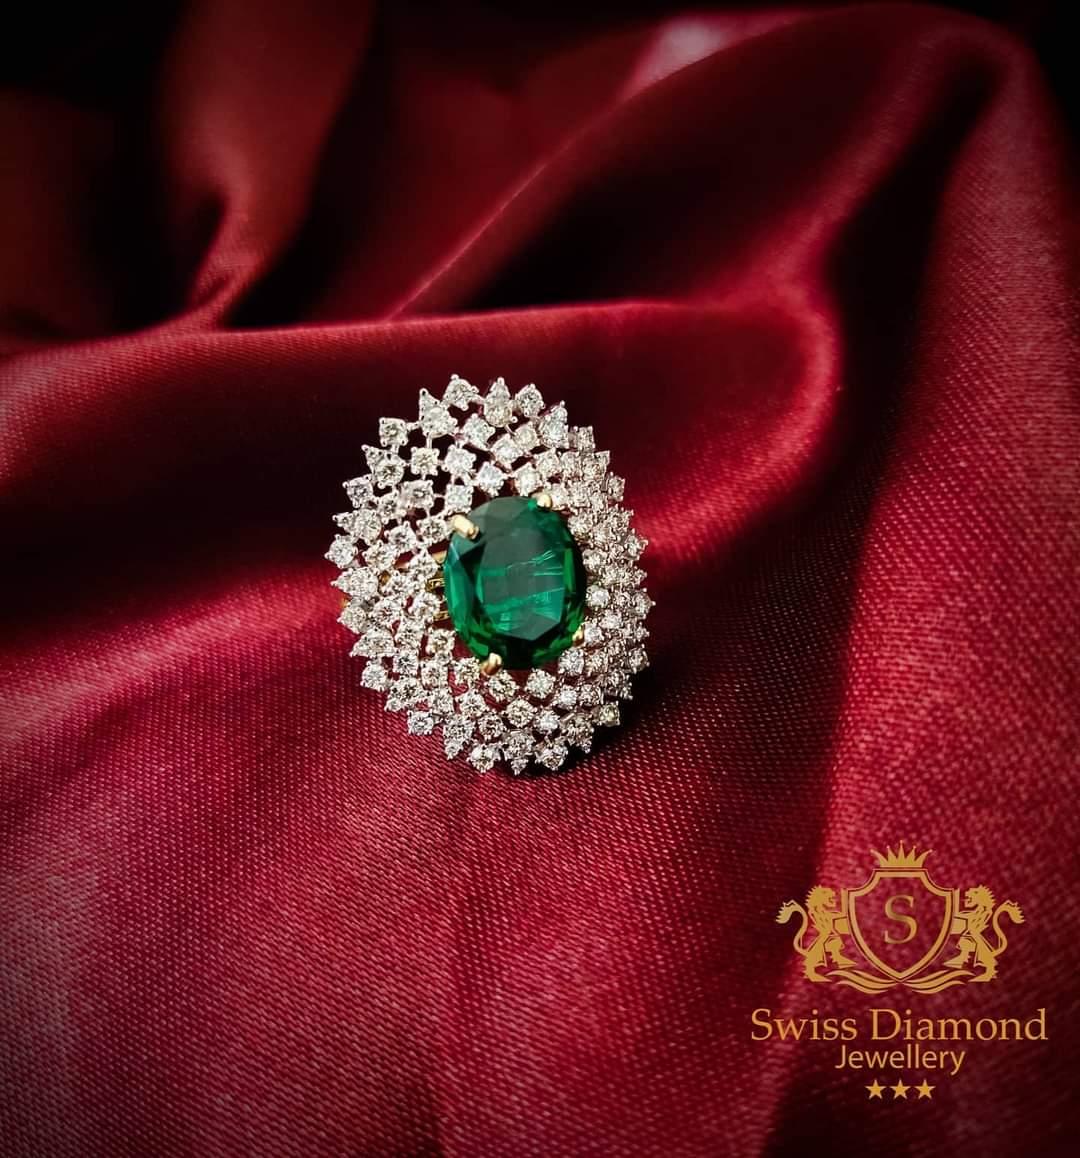 Swiss Diamond Jewellery